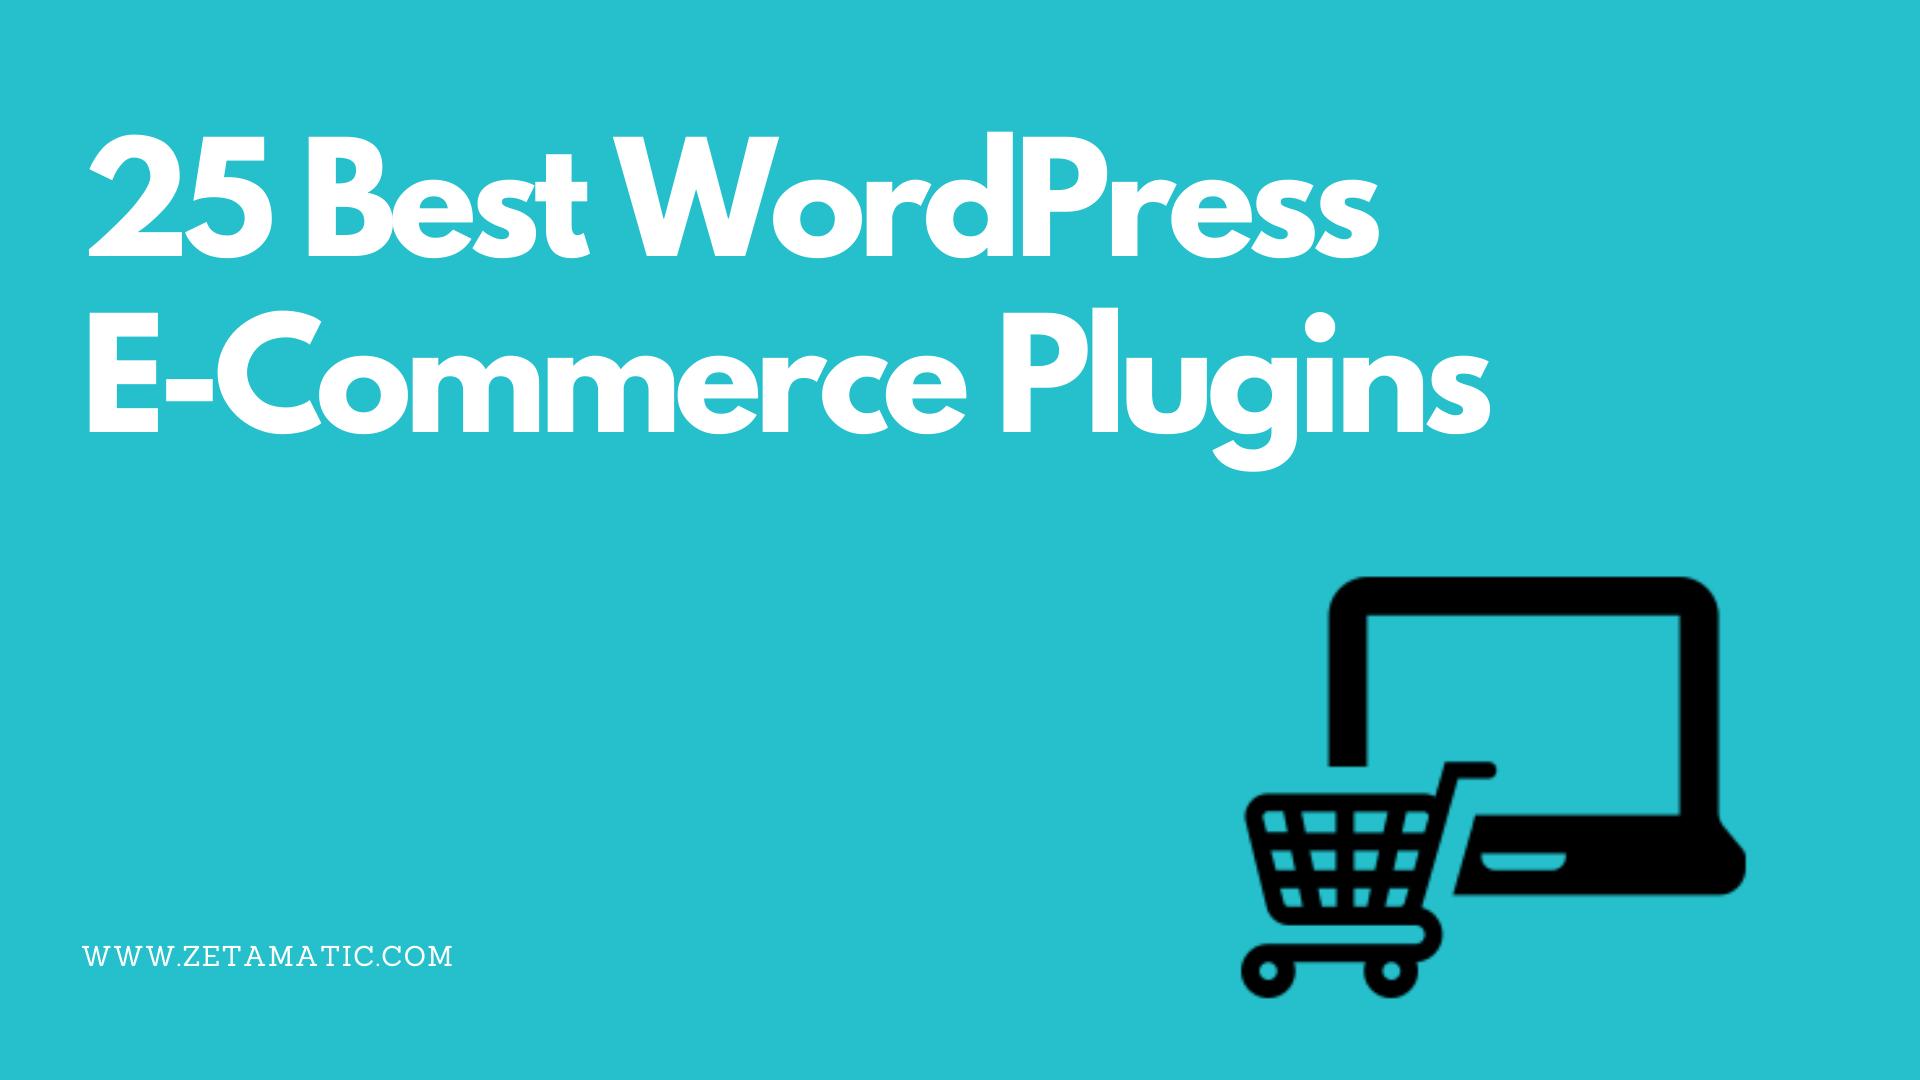 25 Best WordPress E-Commerce Plugins